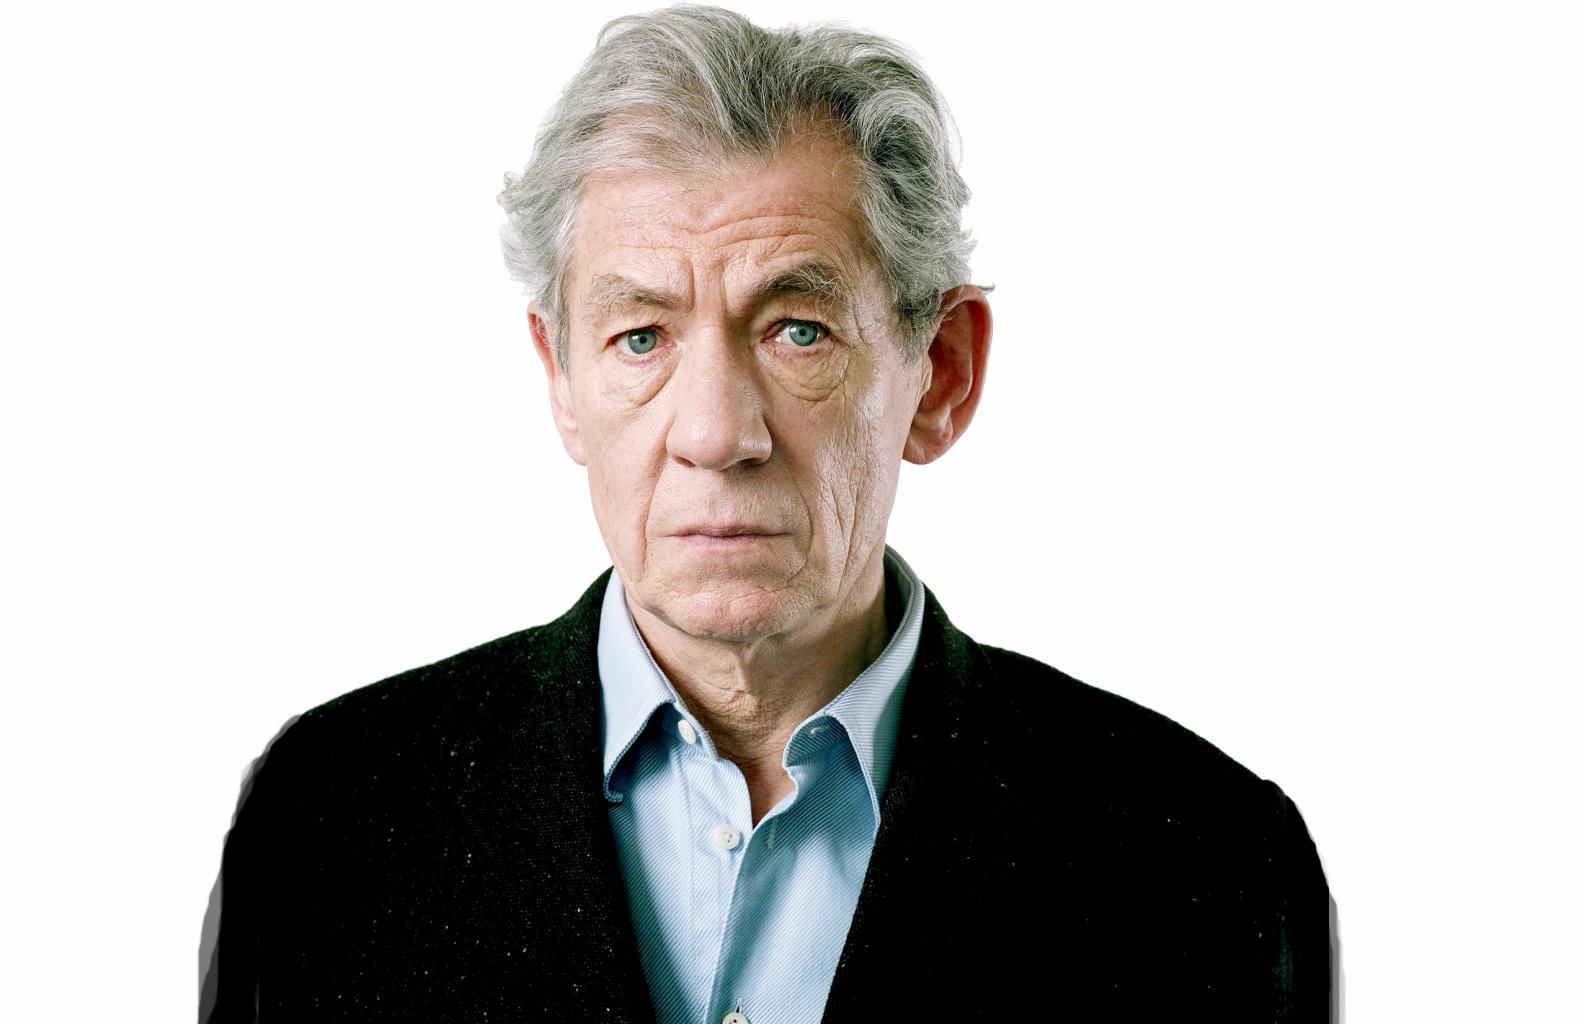 Lord Of The Rings' Star Ian McKellen Slams Oscars For Homophobia